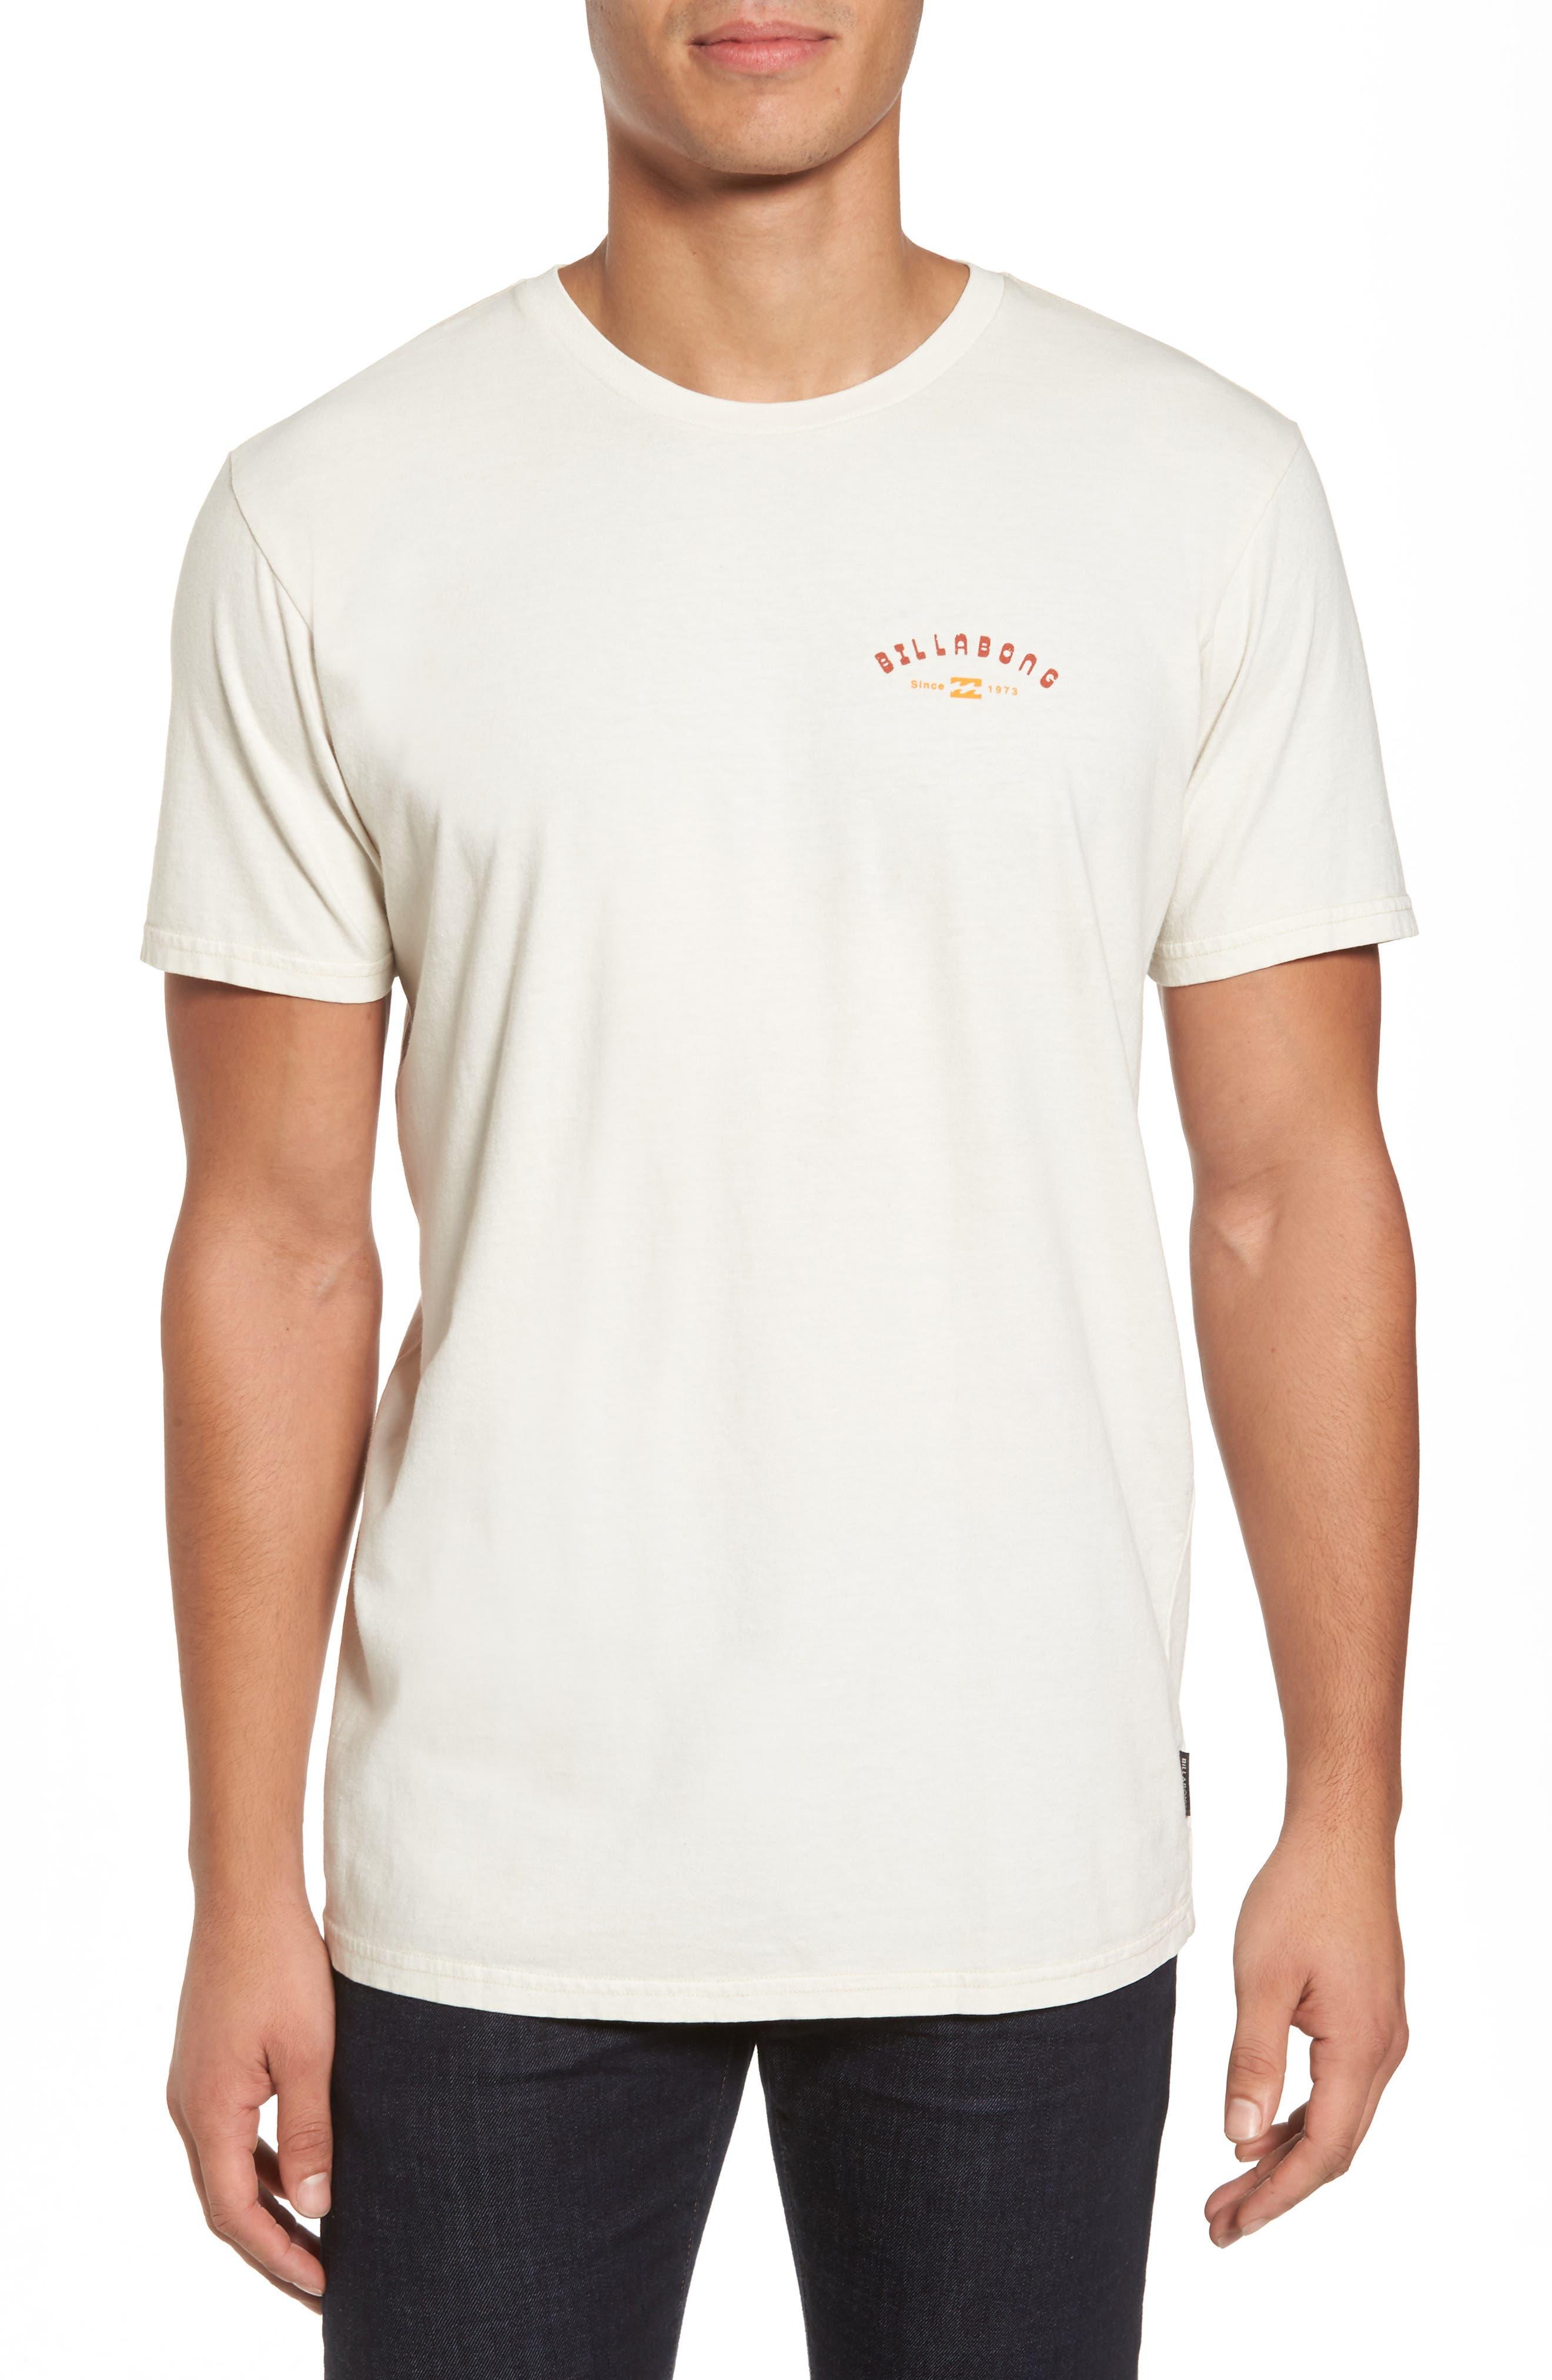 Main Image - Billabong Single Fin Graphic T-Shirt